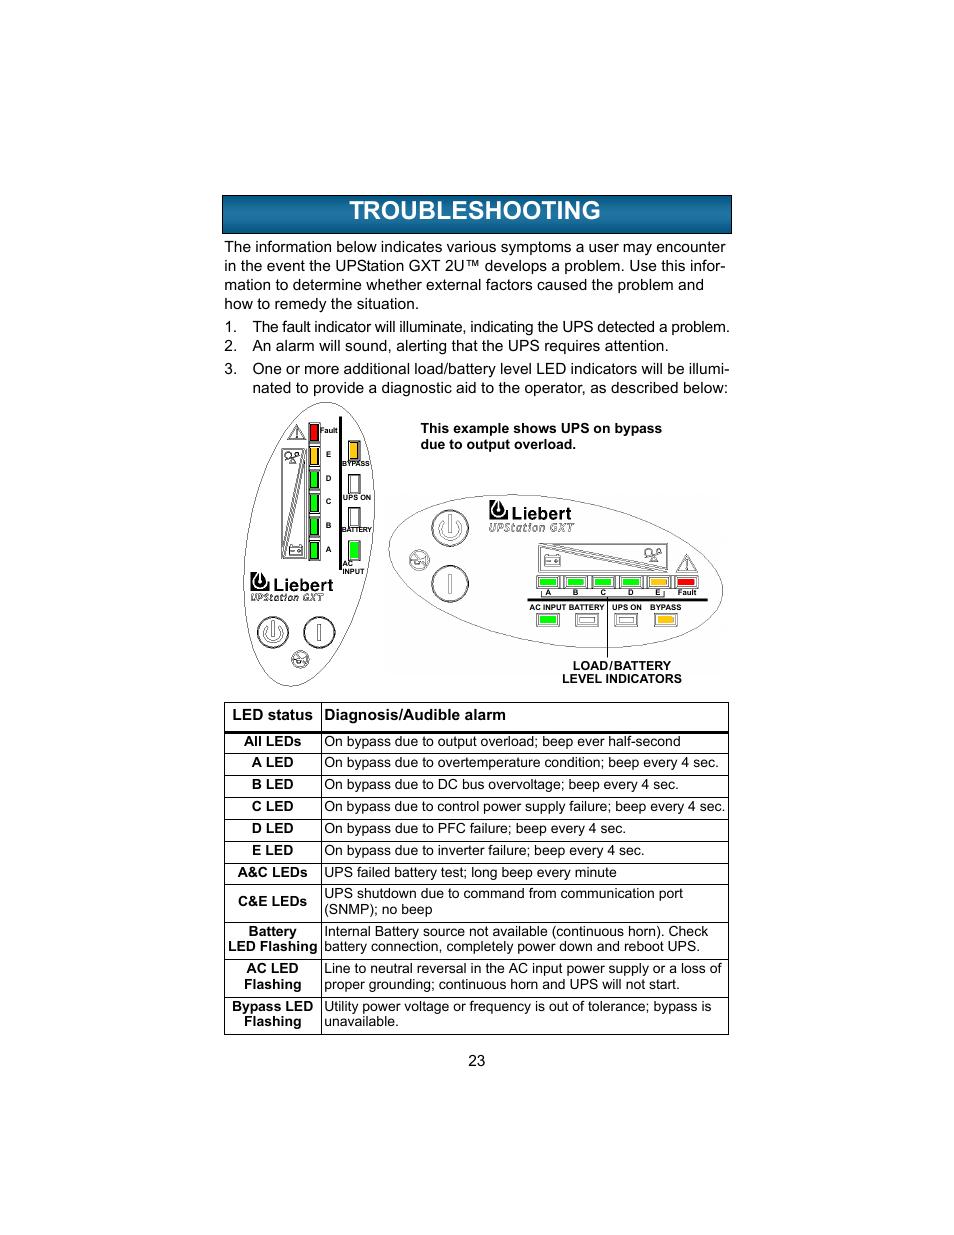 Troubleshooting Roubleshooting Liebert Upstation Gxt 2u User Flashing Led Battery Status Indicator Manual Page 27 38